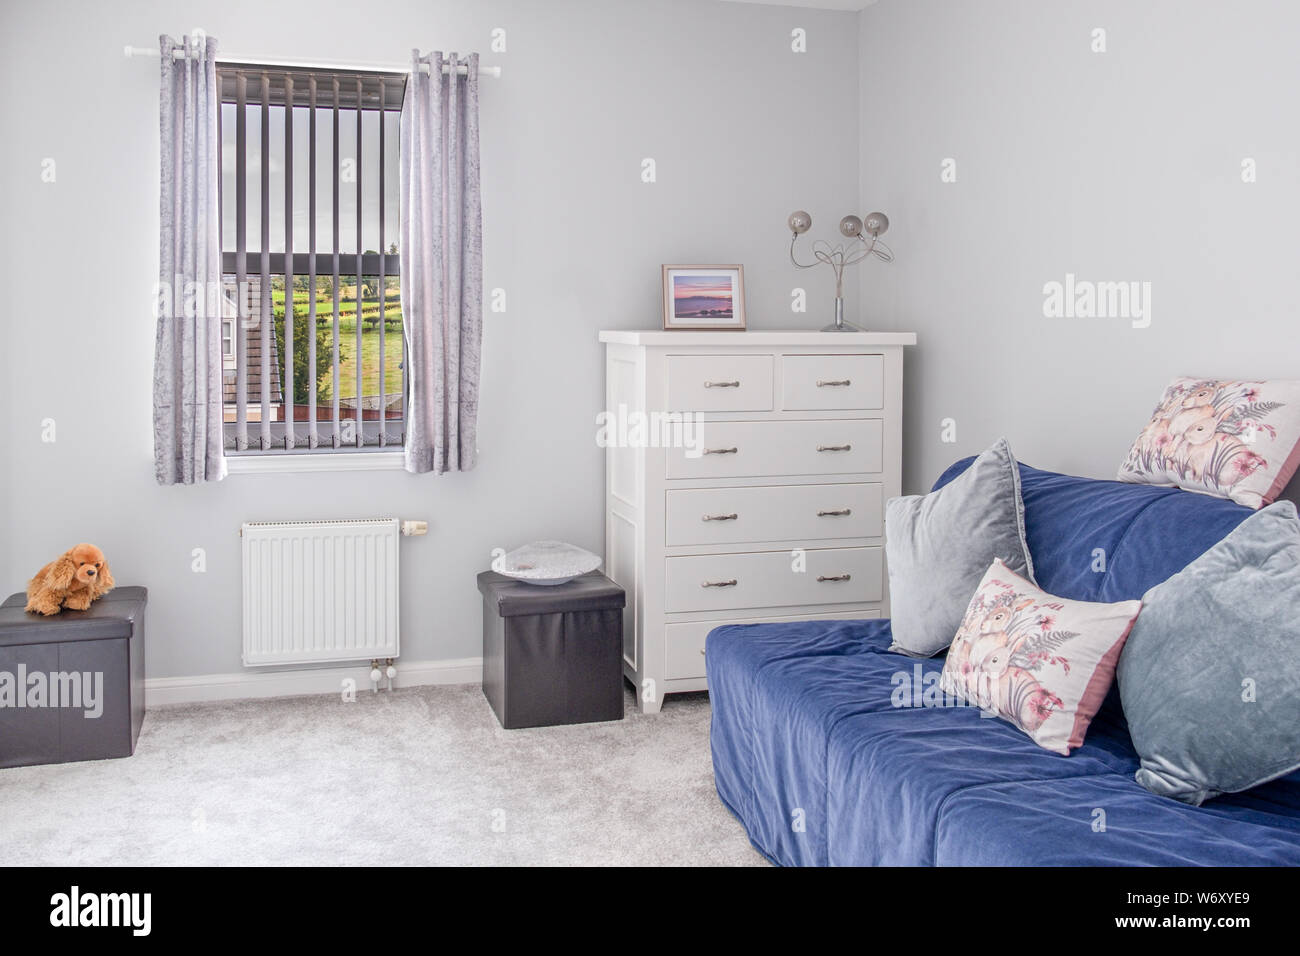 Peachy Small Spare Room In Modern Housing Developement With A Sofa Inzonedesignstudio Interior Chair Design Inzonedesignstudiocom